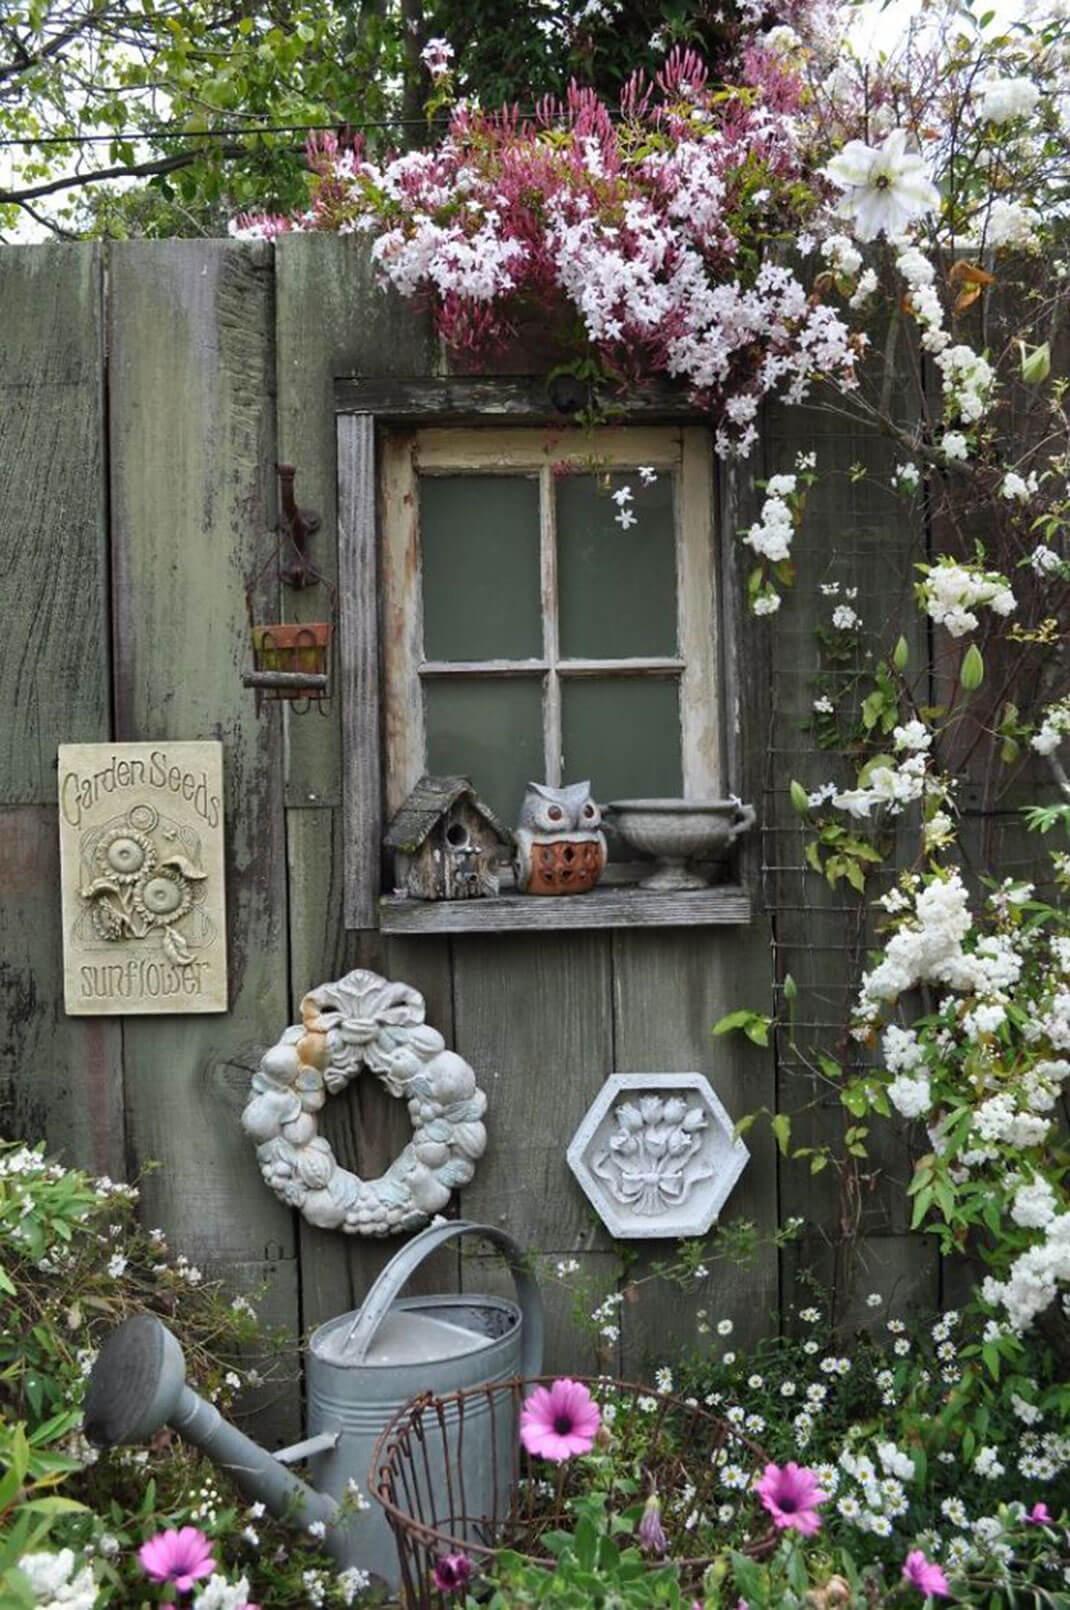 Garden Window Scene with Cute Owl Statue